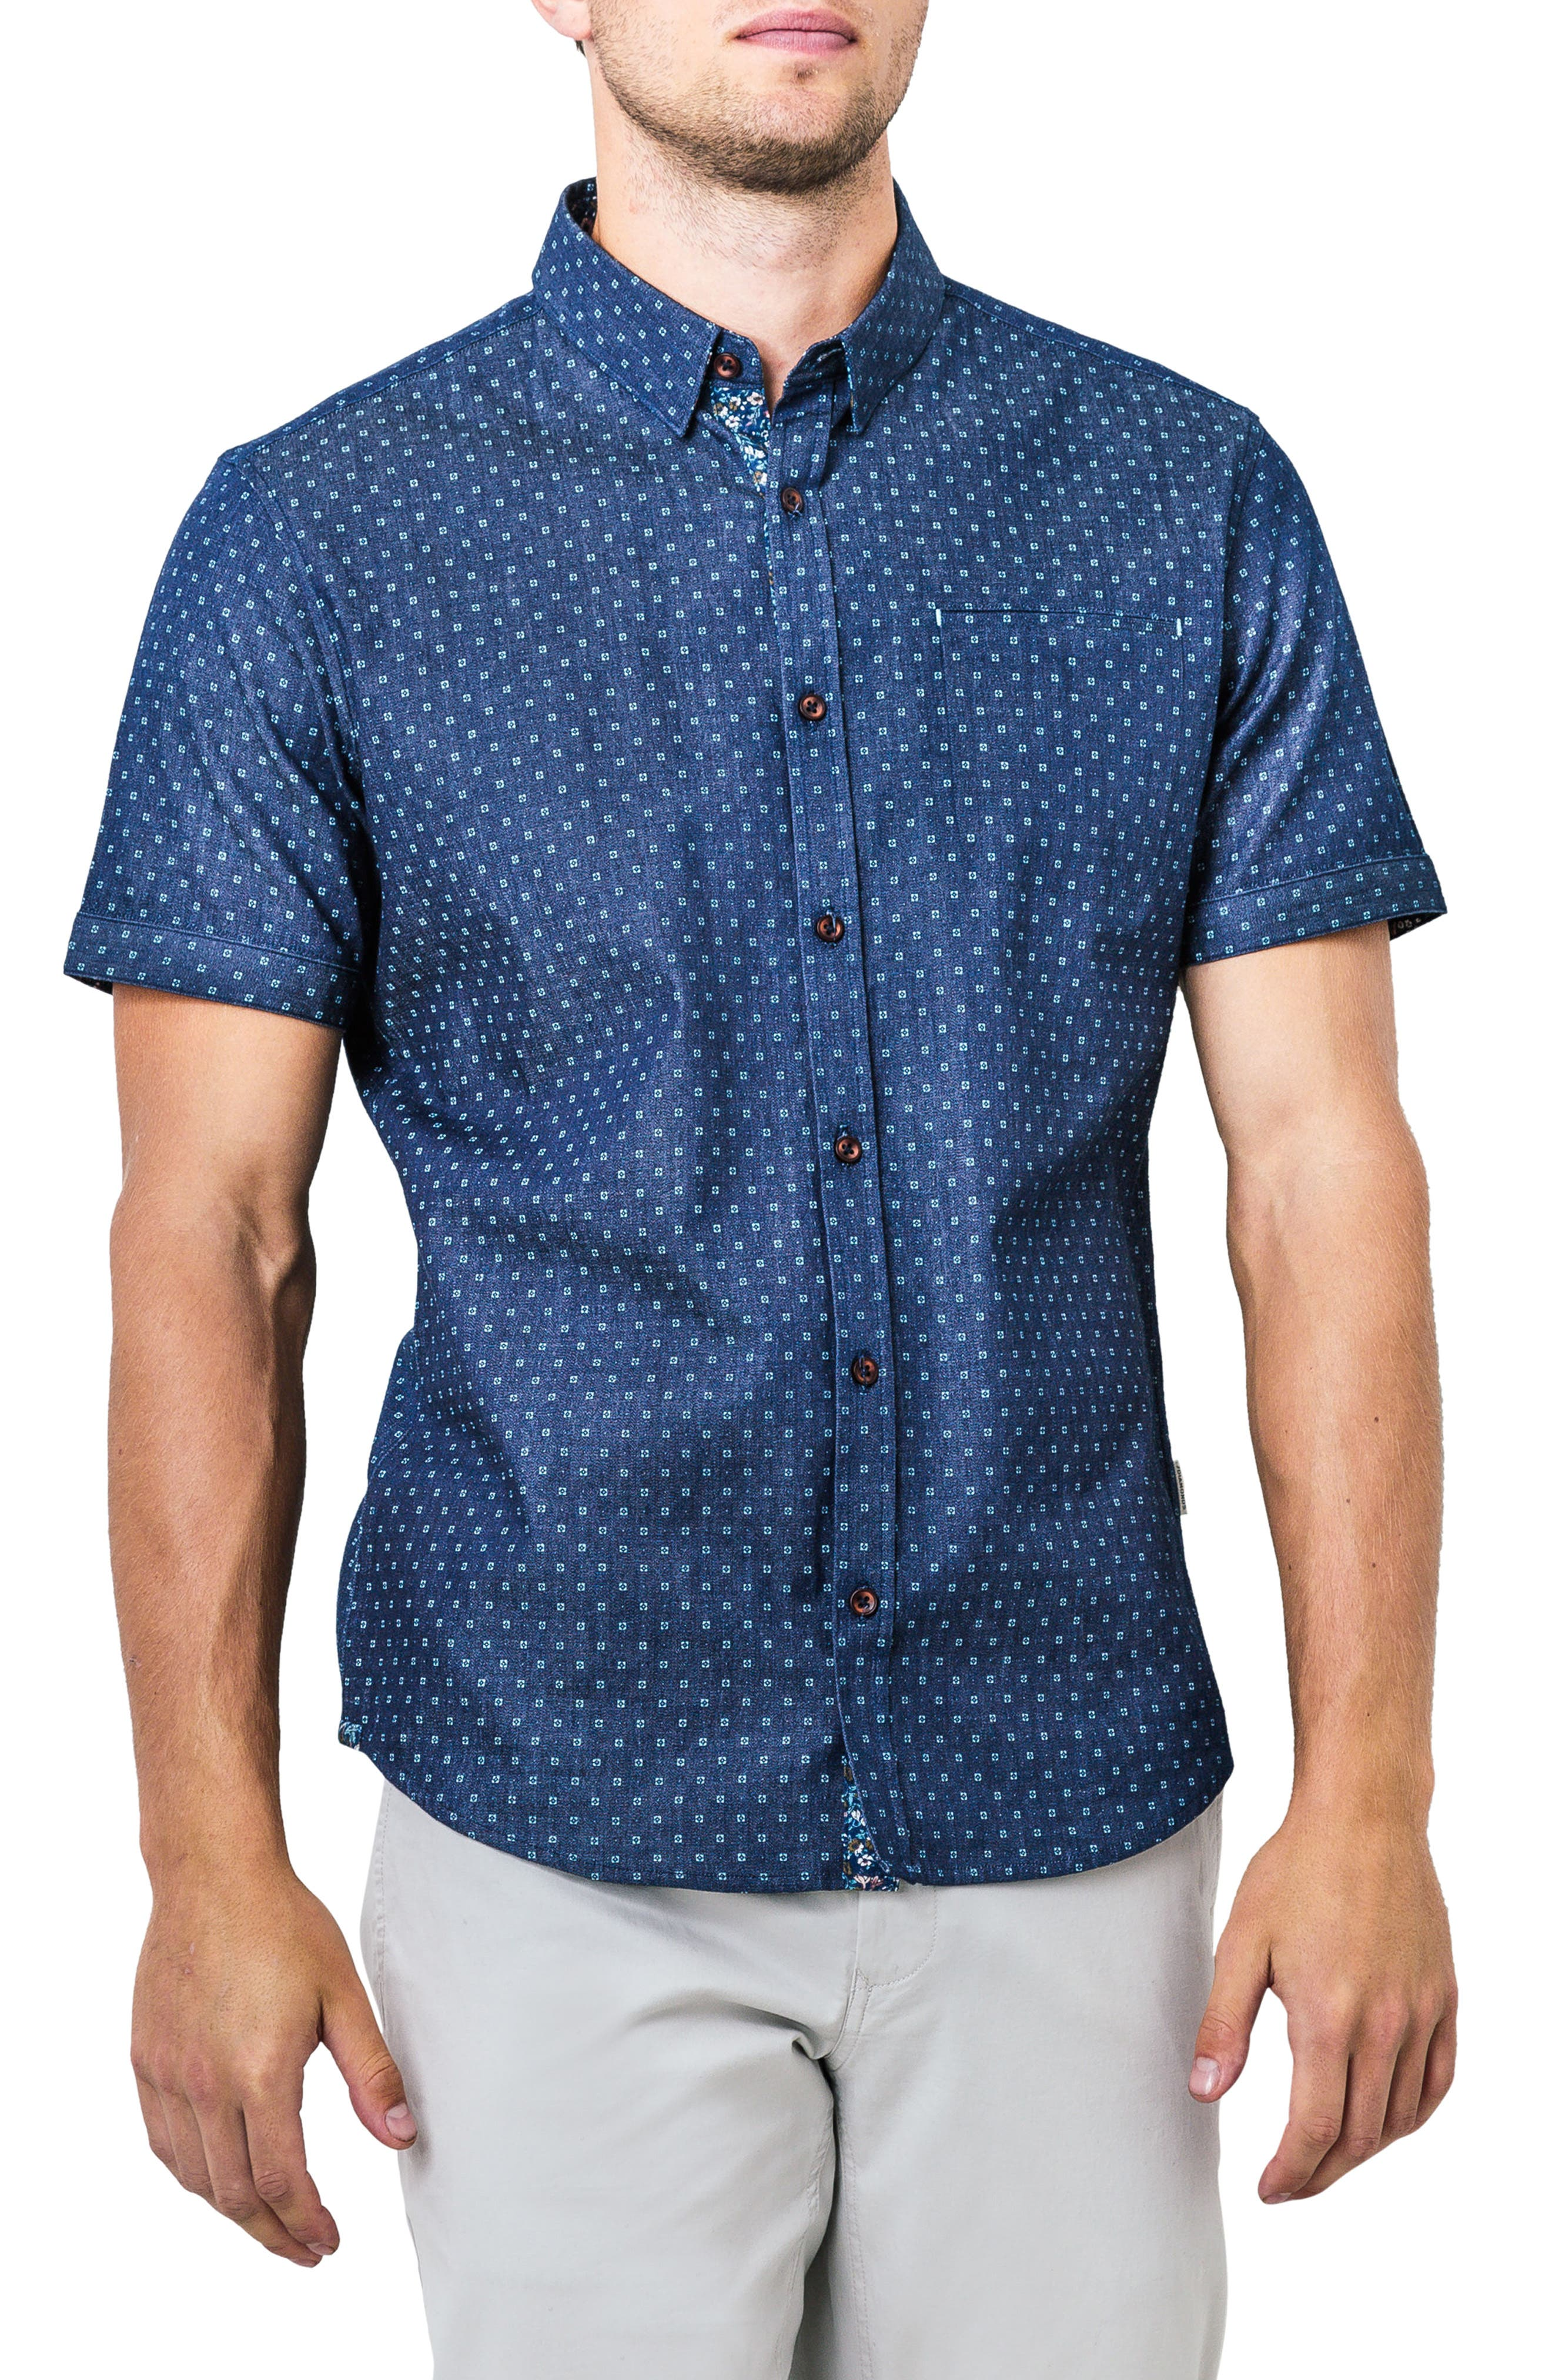 Main Image - 7 Diamonds Innervision Woven Shirt